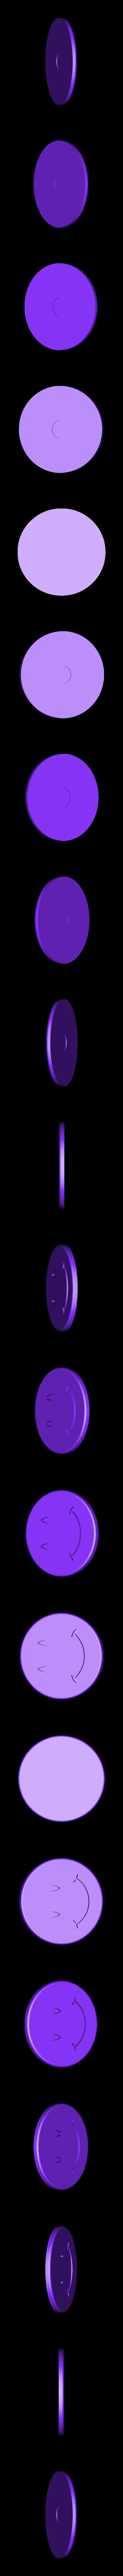 Centre_Watch_2.stl Download STL file Hand Spinner Watchmen • 3D printer model, Guich